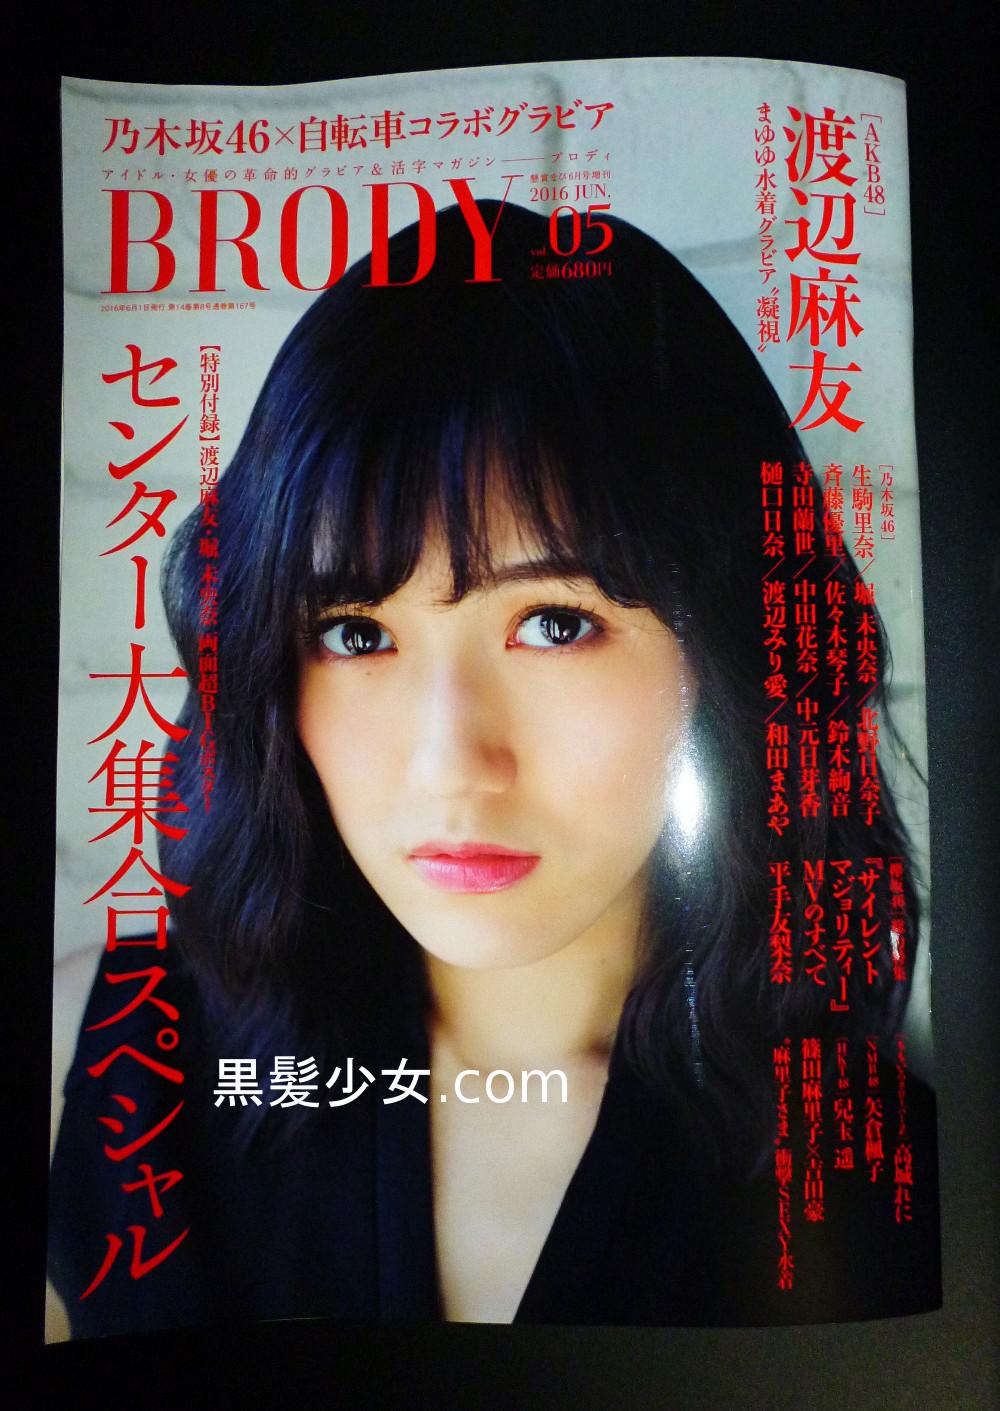 BRODY (ブロディ) Vol.5を買う [矢倉楓子・渡辺麻友・堀未央奈・平手友梨奈・兒玉遥] (1)